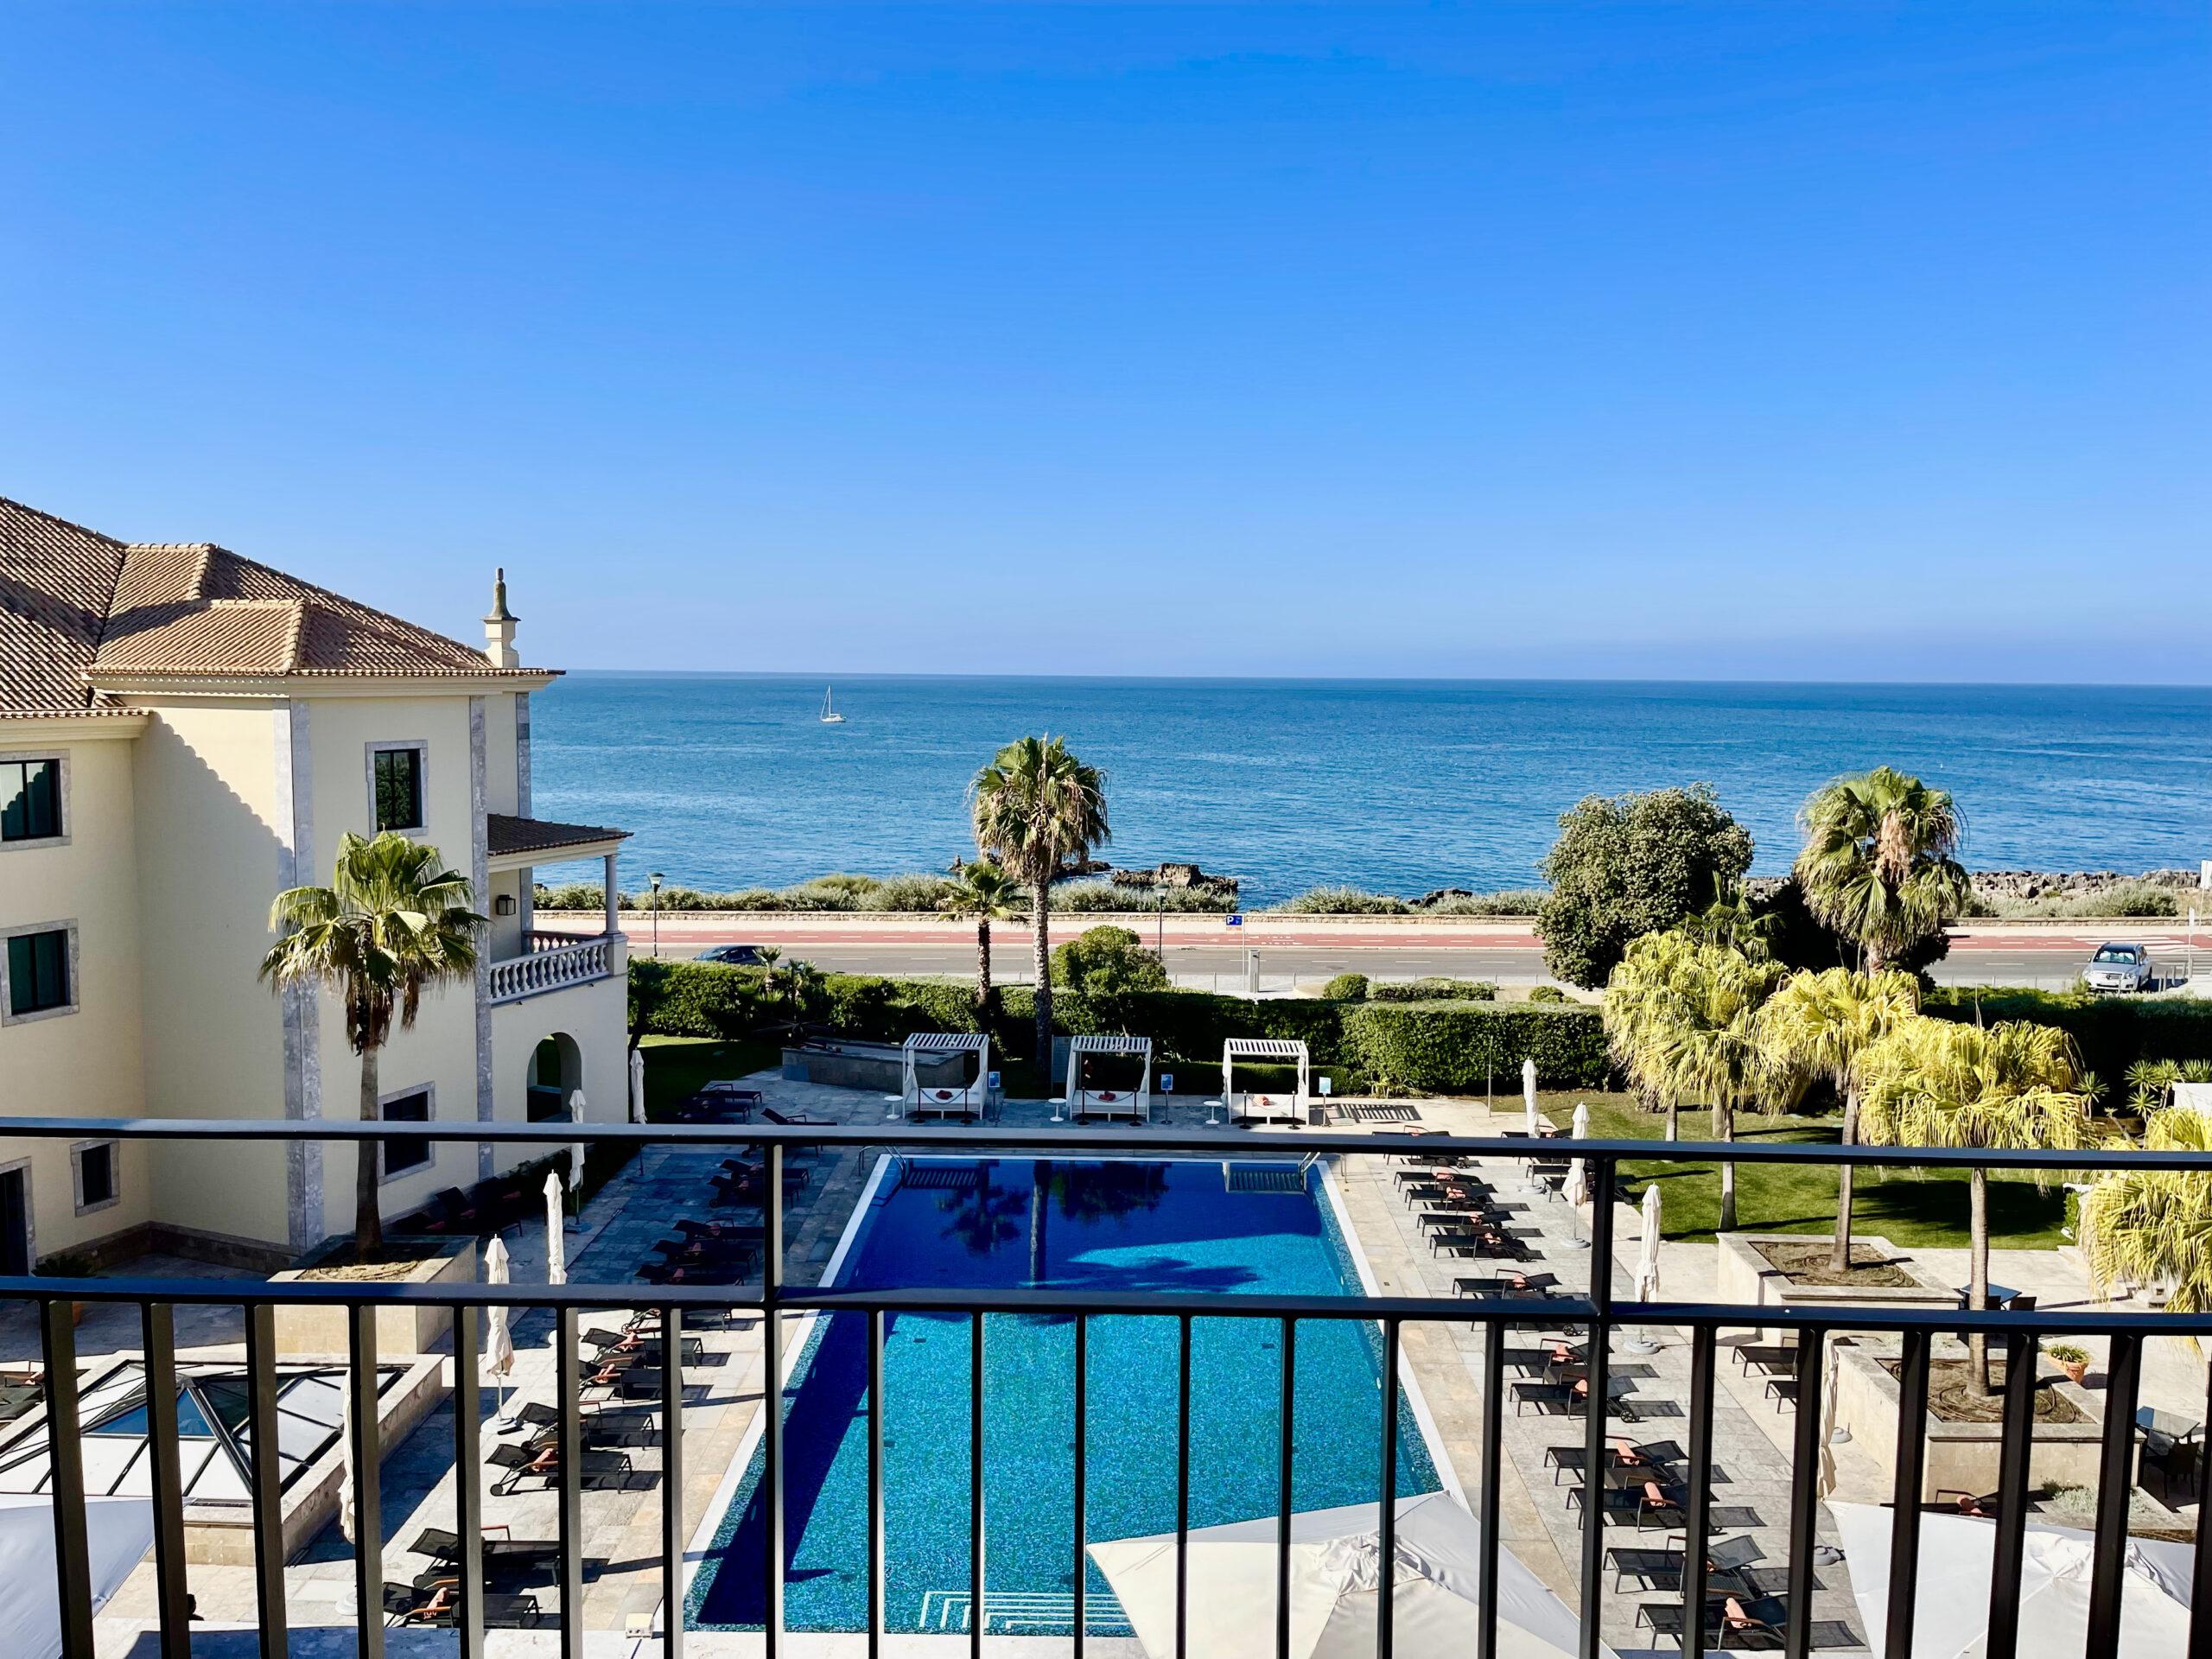 Pool view at the Grande Real Villa Italia Hotel and Spa Cascais